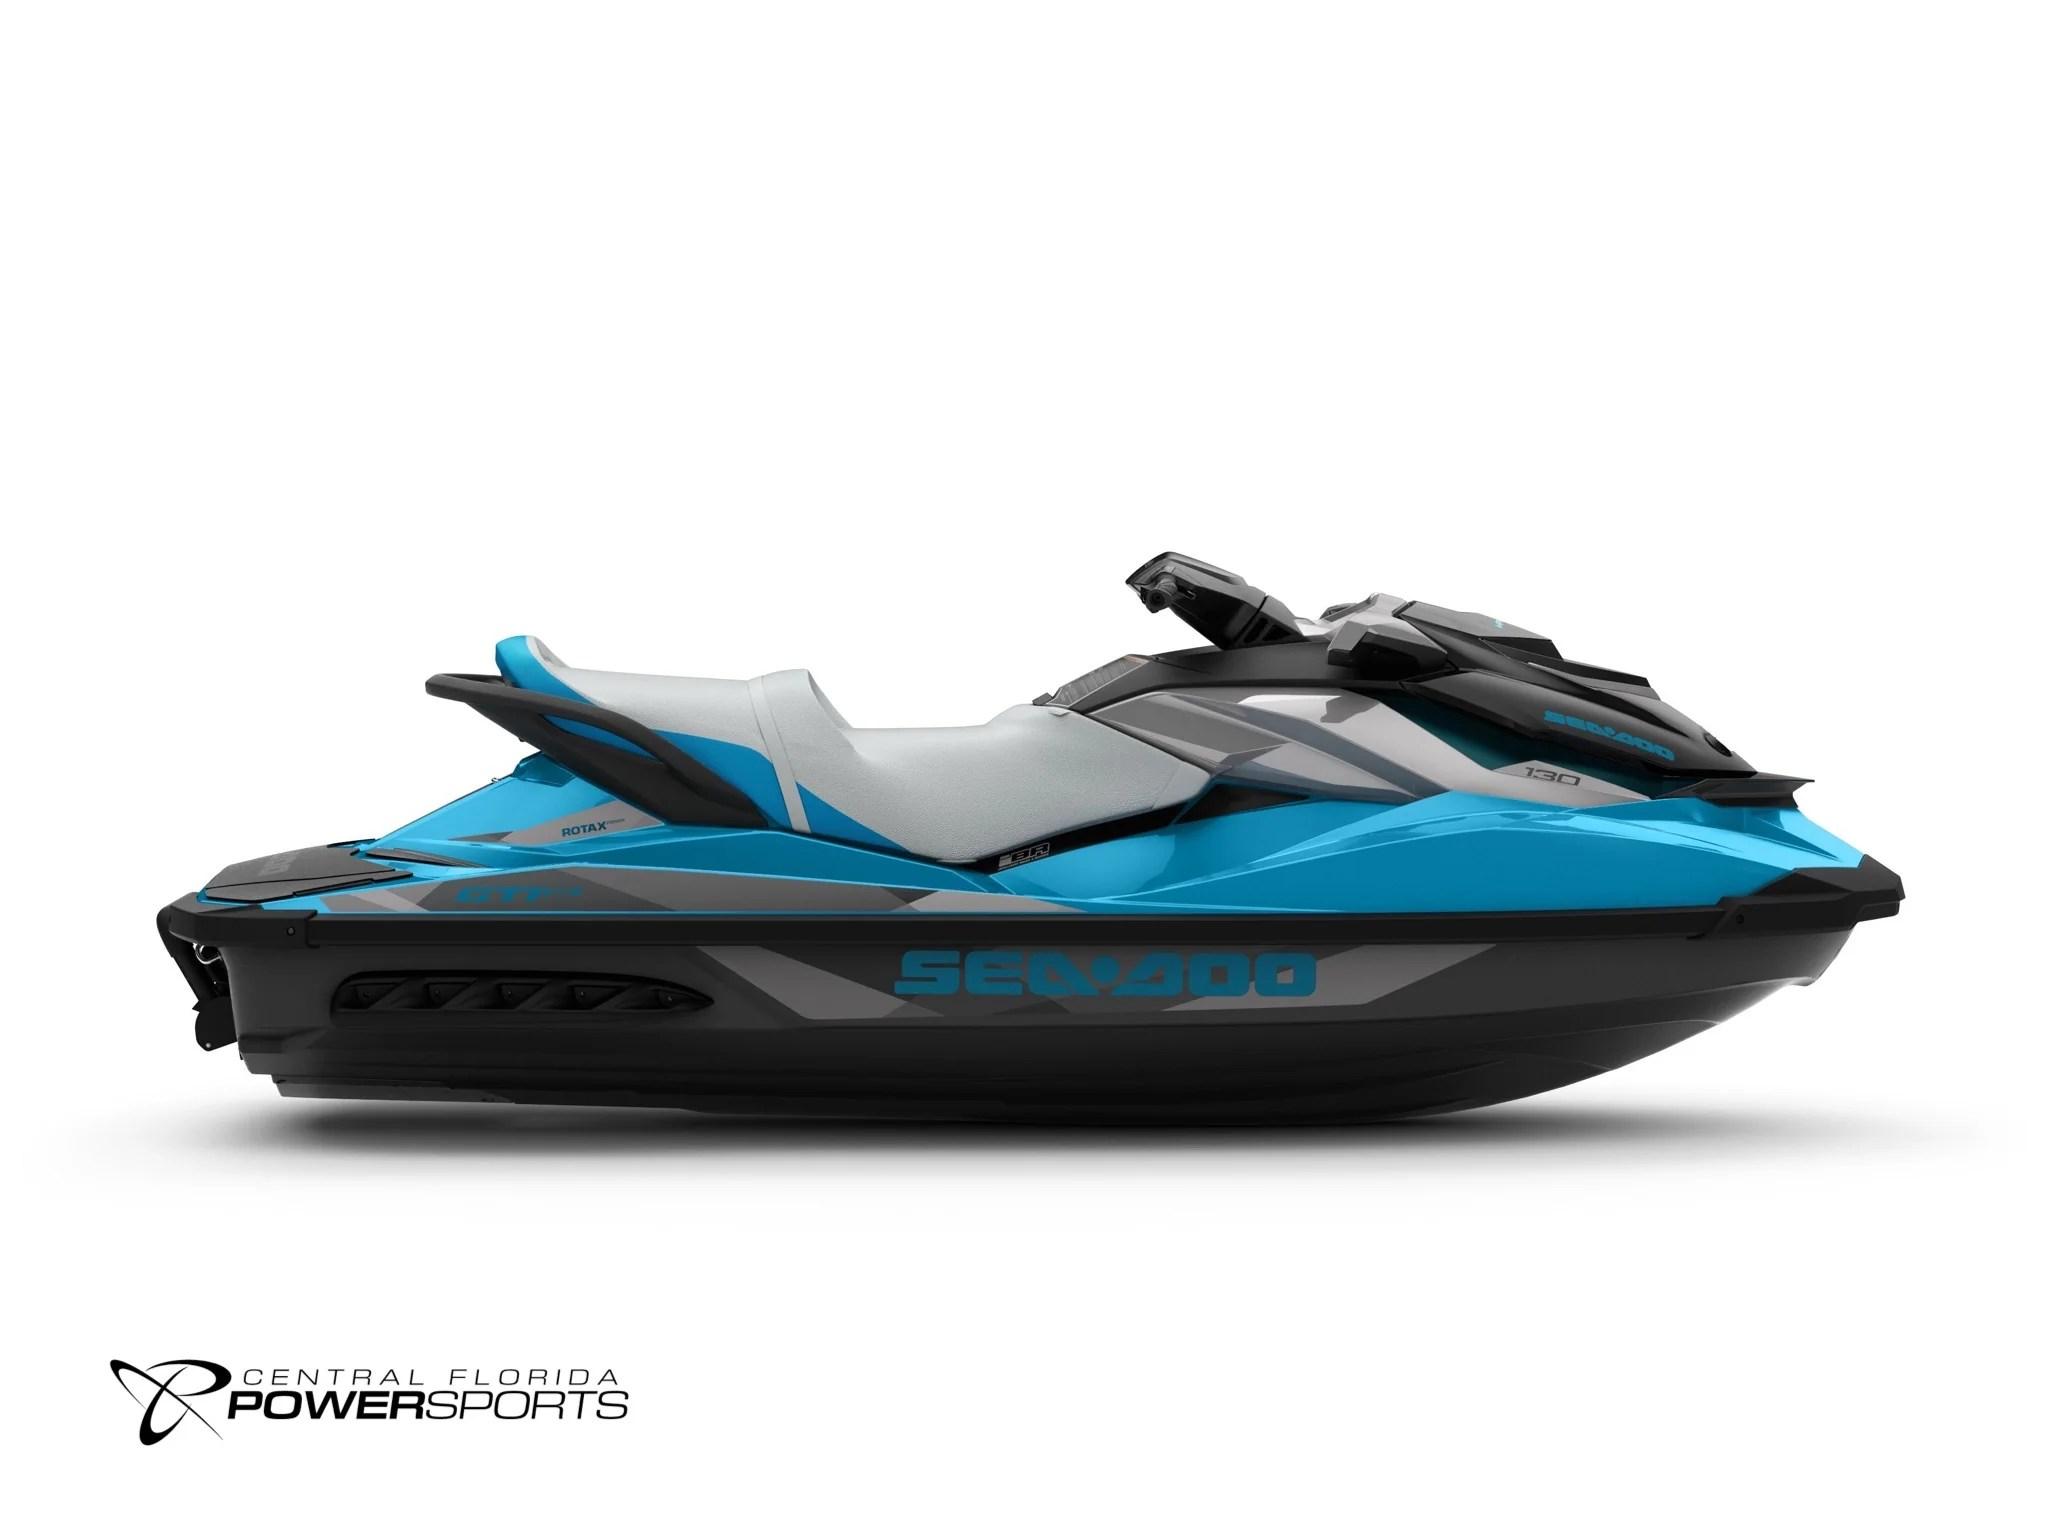 2018_Yamaha_FJR1300ES_Central_Florida_PowerSports_3 Central Florida Yamaha